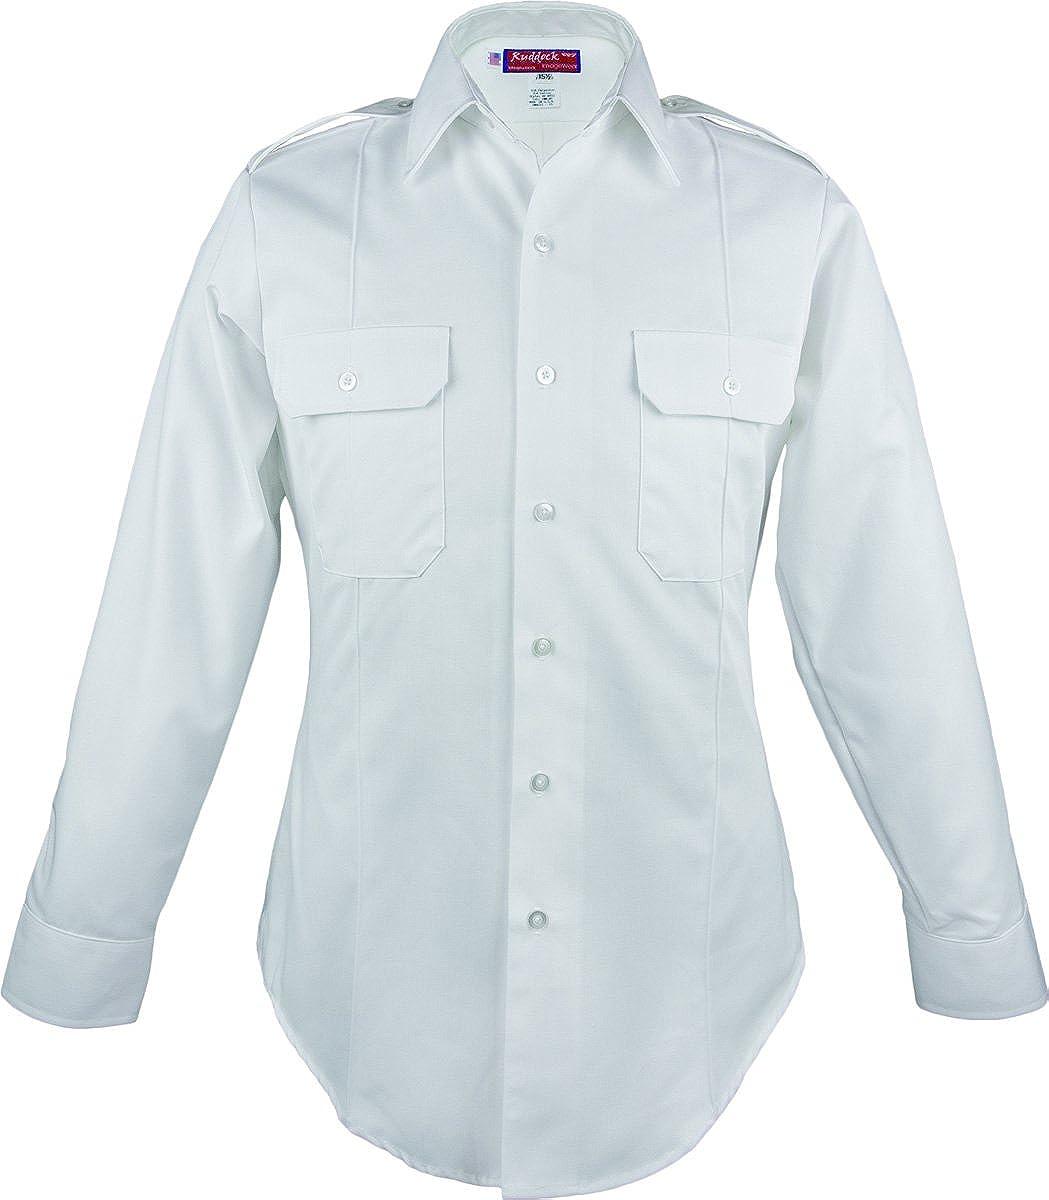 Long Sleeve Dedication White Shirt High quality Duty